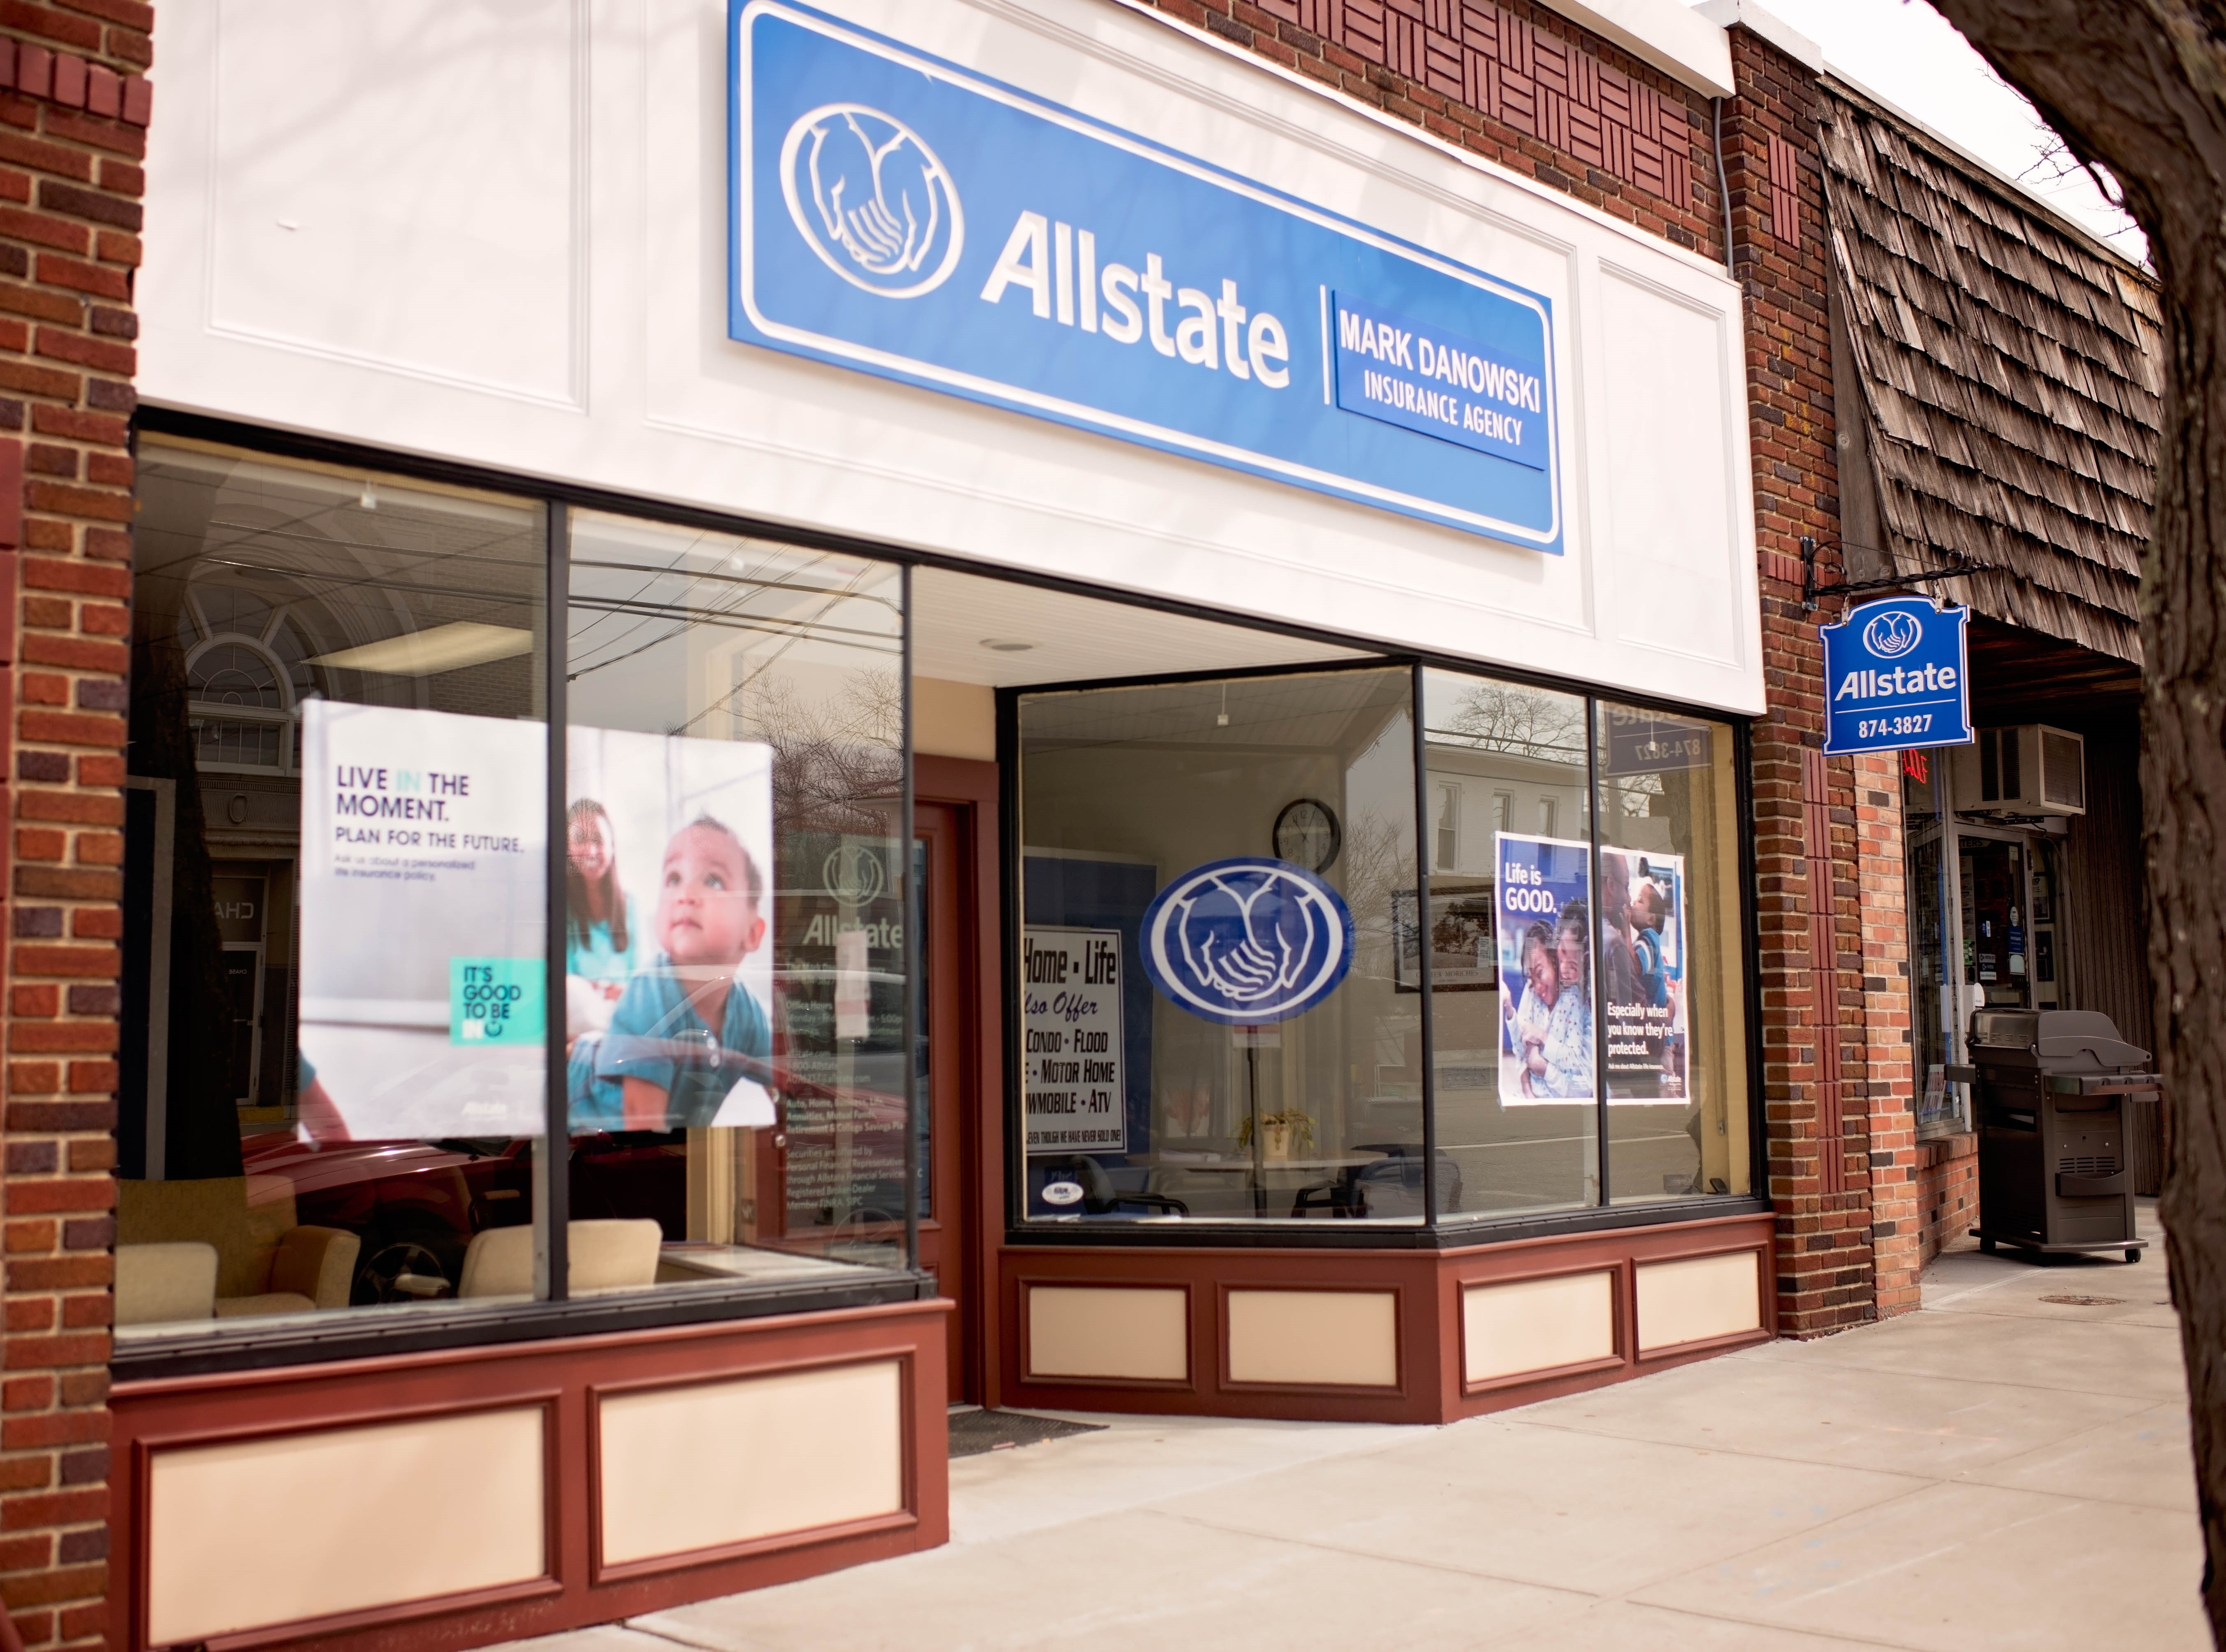 Mark Danowski: Allstate Insurance image 1